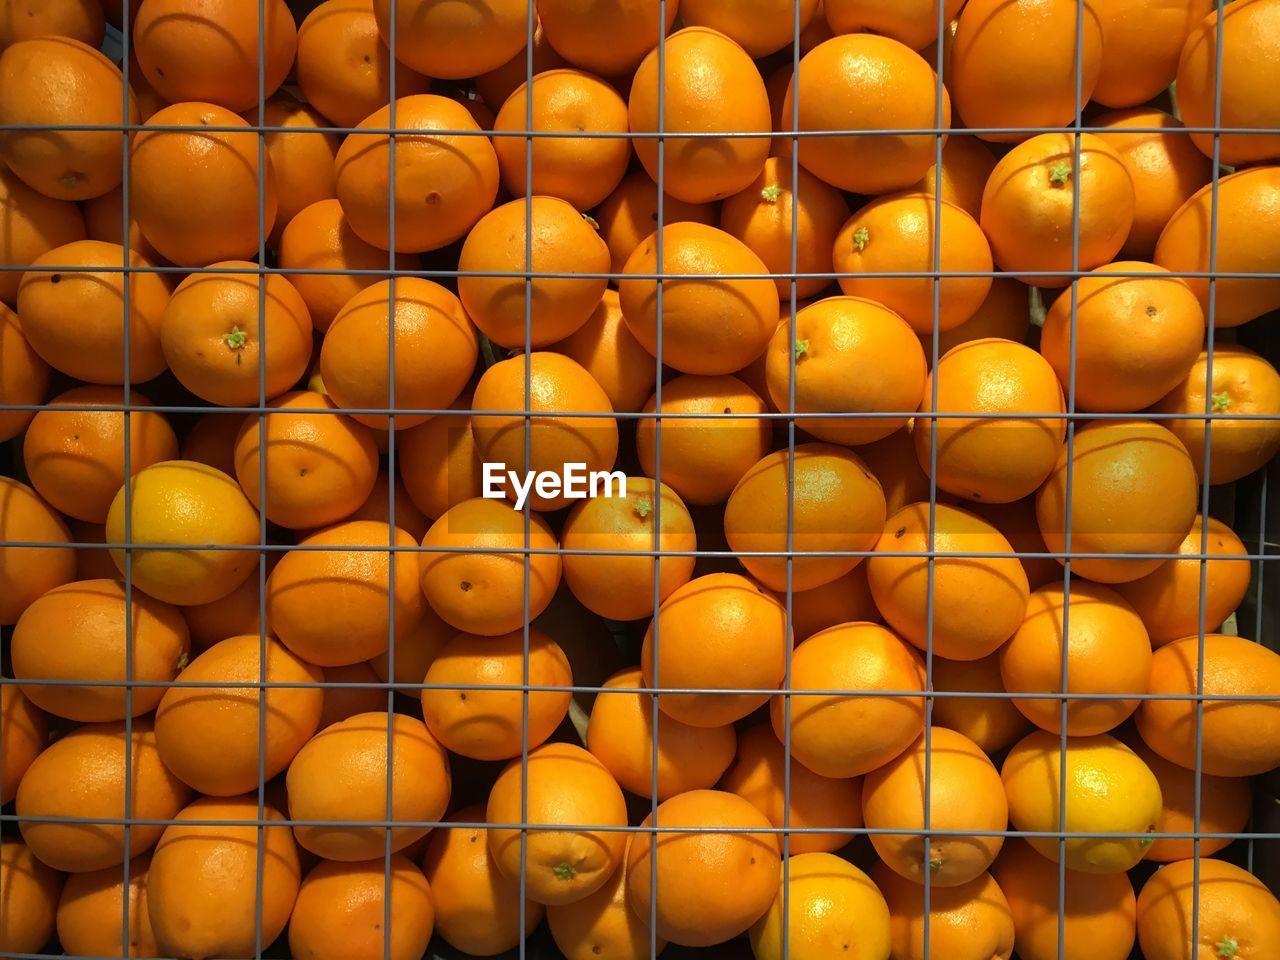 Close-Up Of Oranges On Display